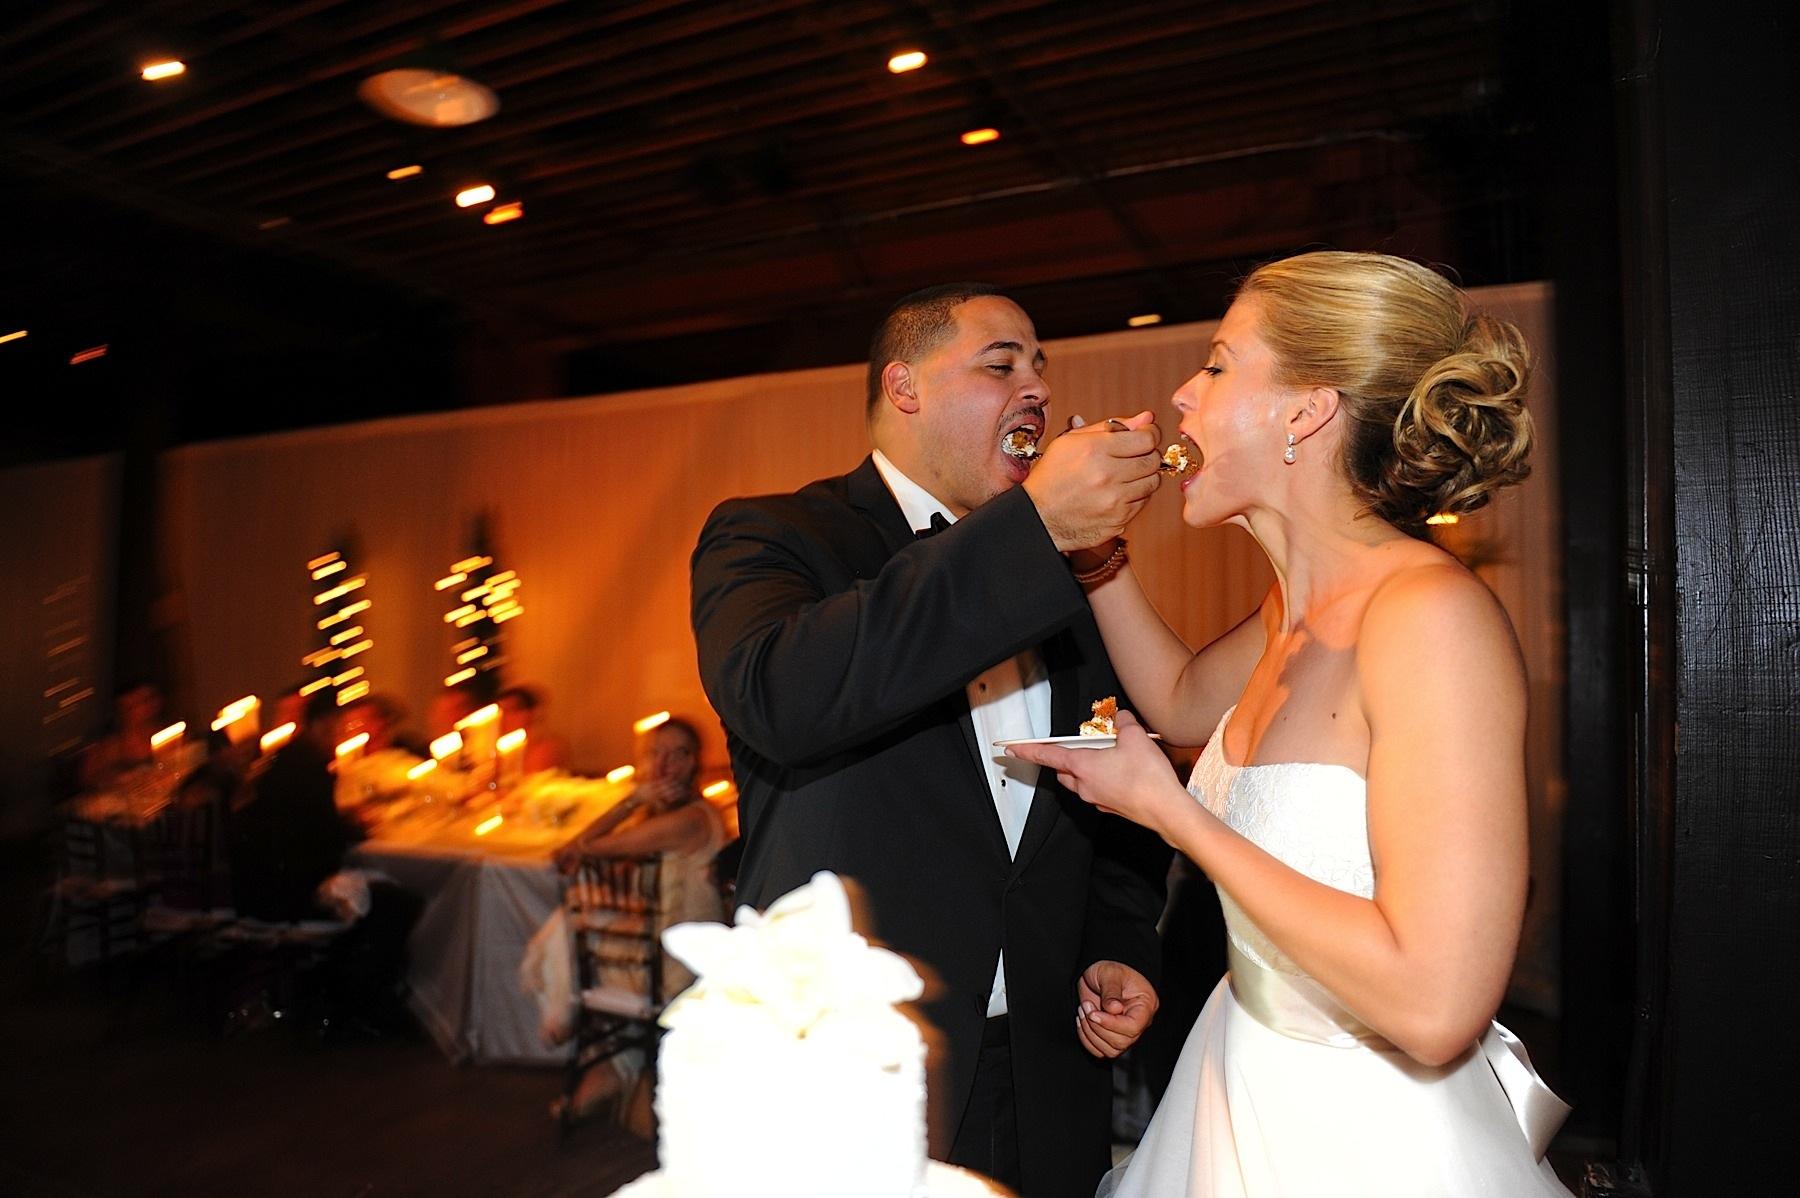 culinary_institute_of_america_napa_valley_wedding_113photographer_